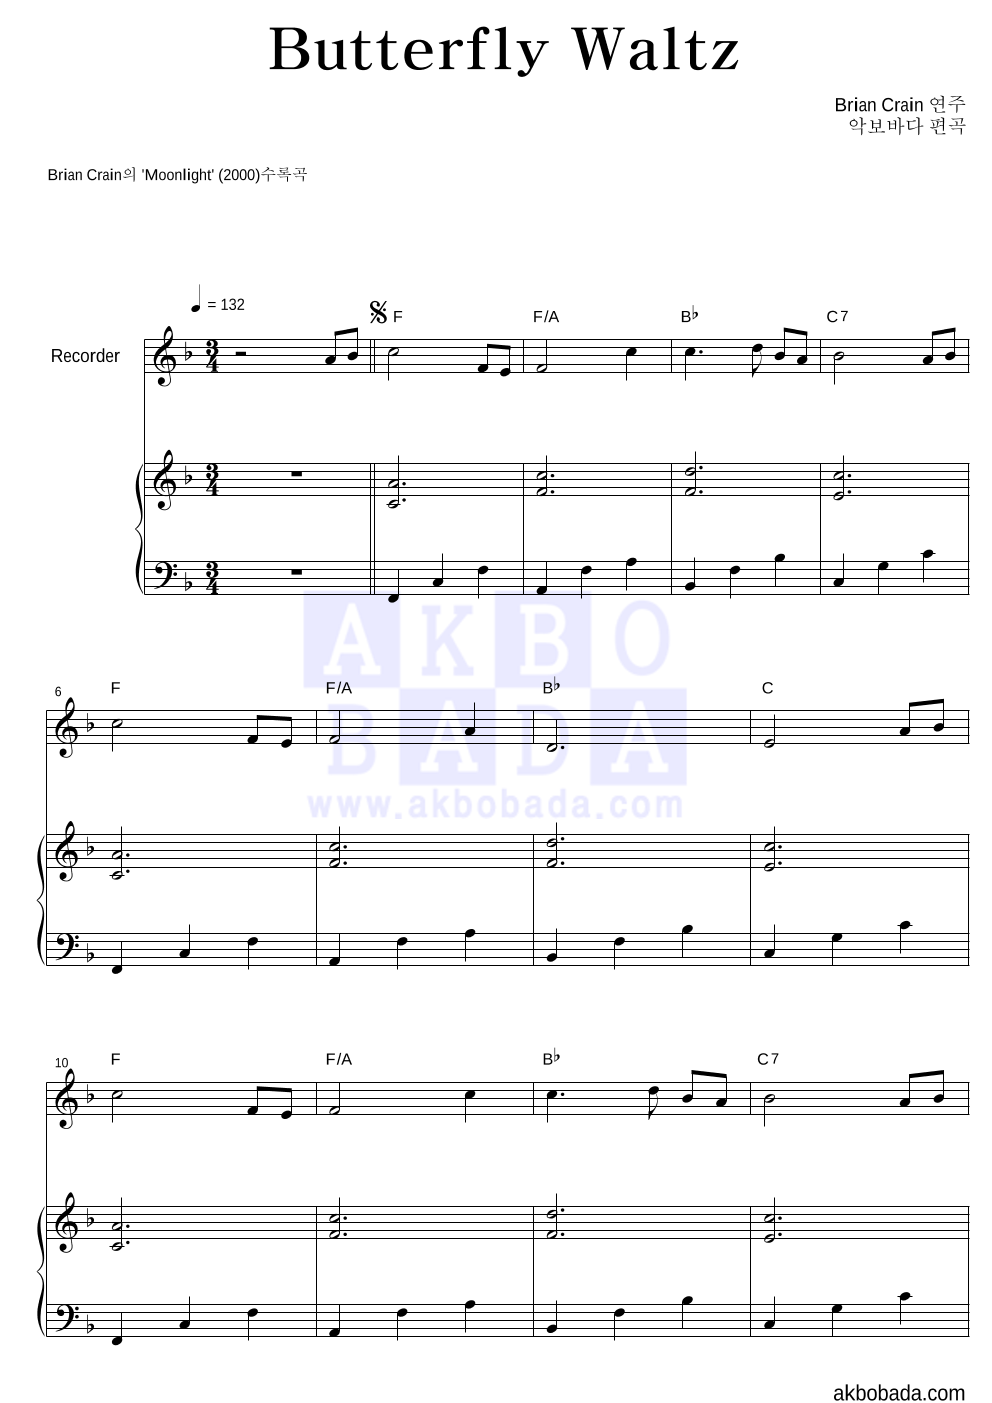 Brian Crain - Butterfly Waltz 리코더&피아노 악보